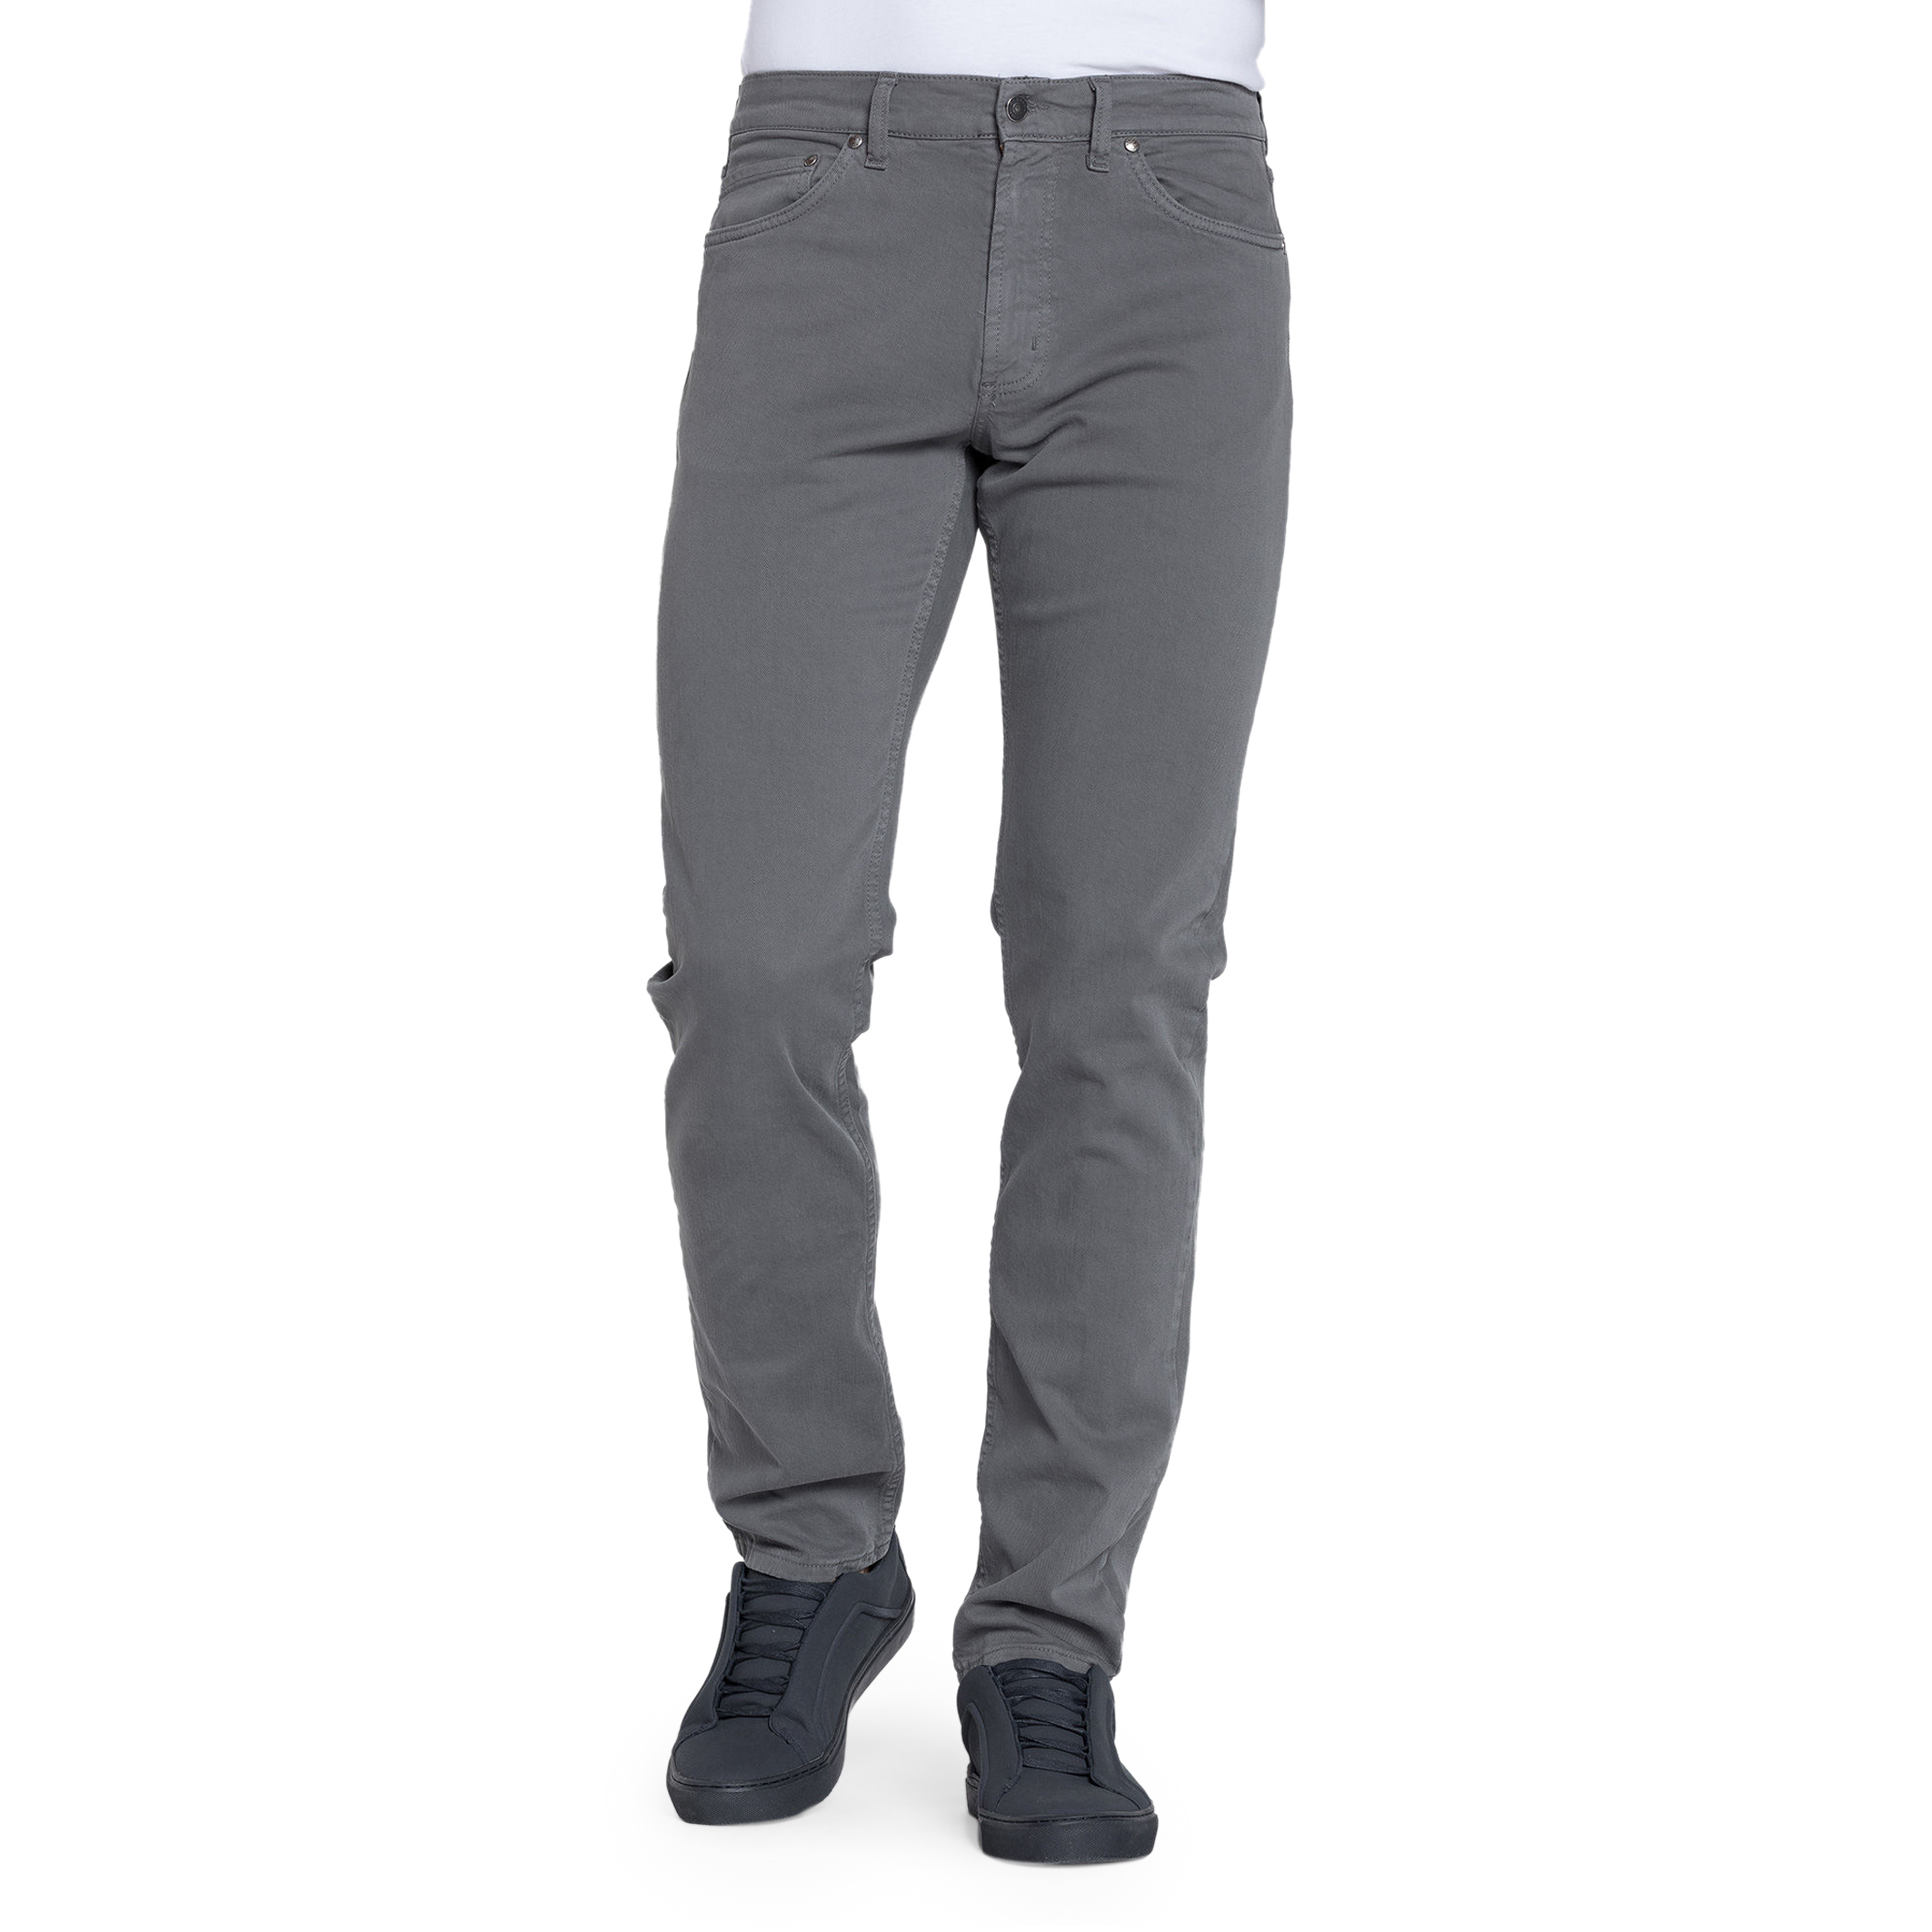 Carrera Jeans 000700 9302A